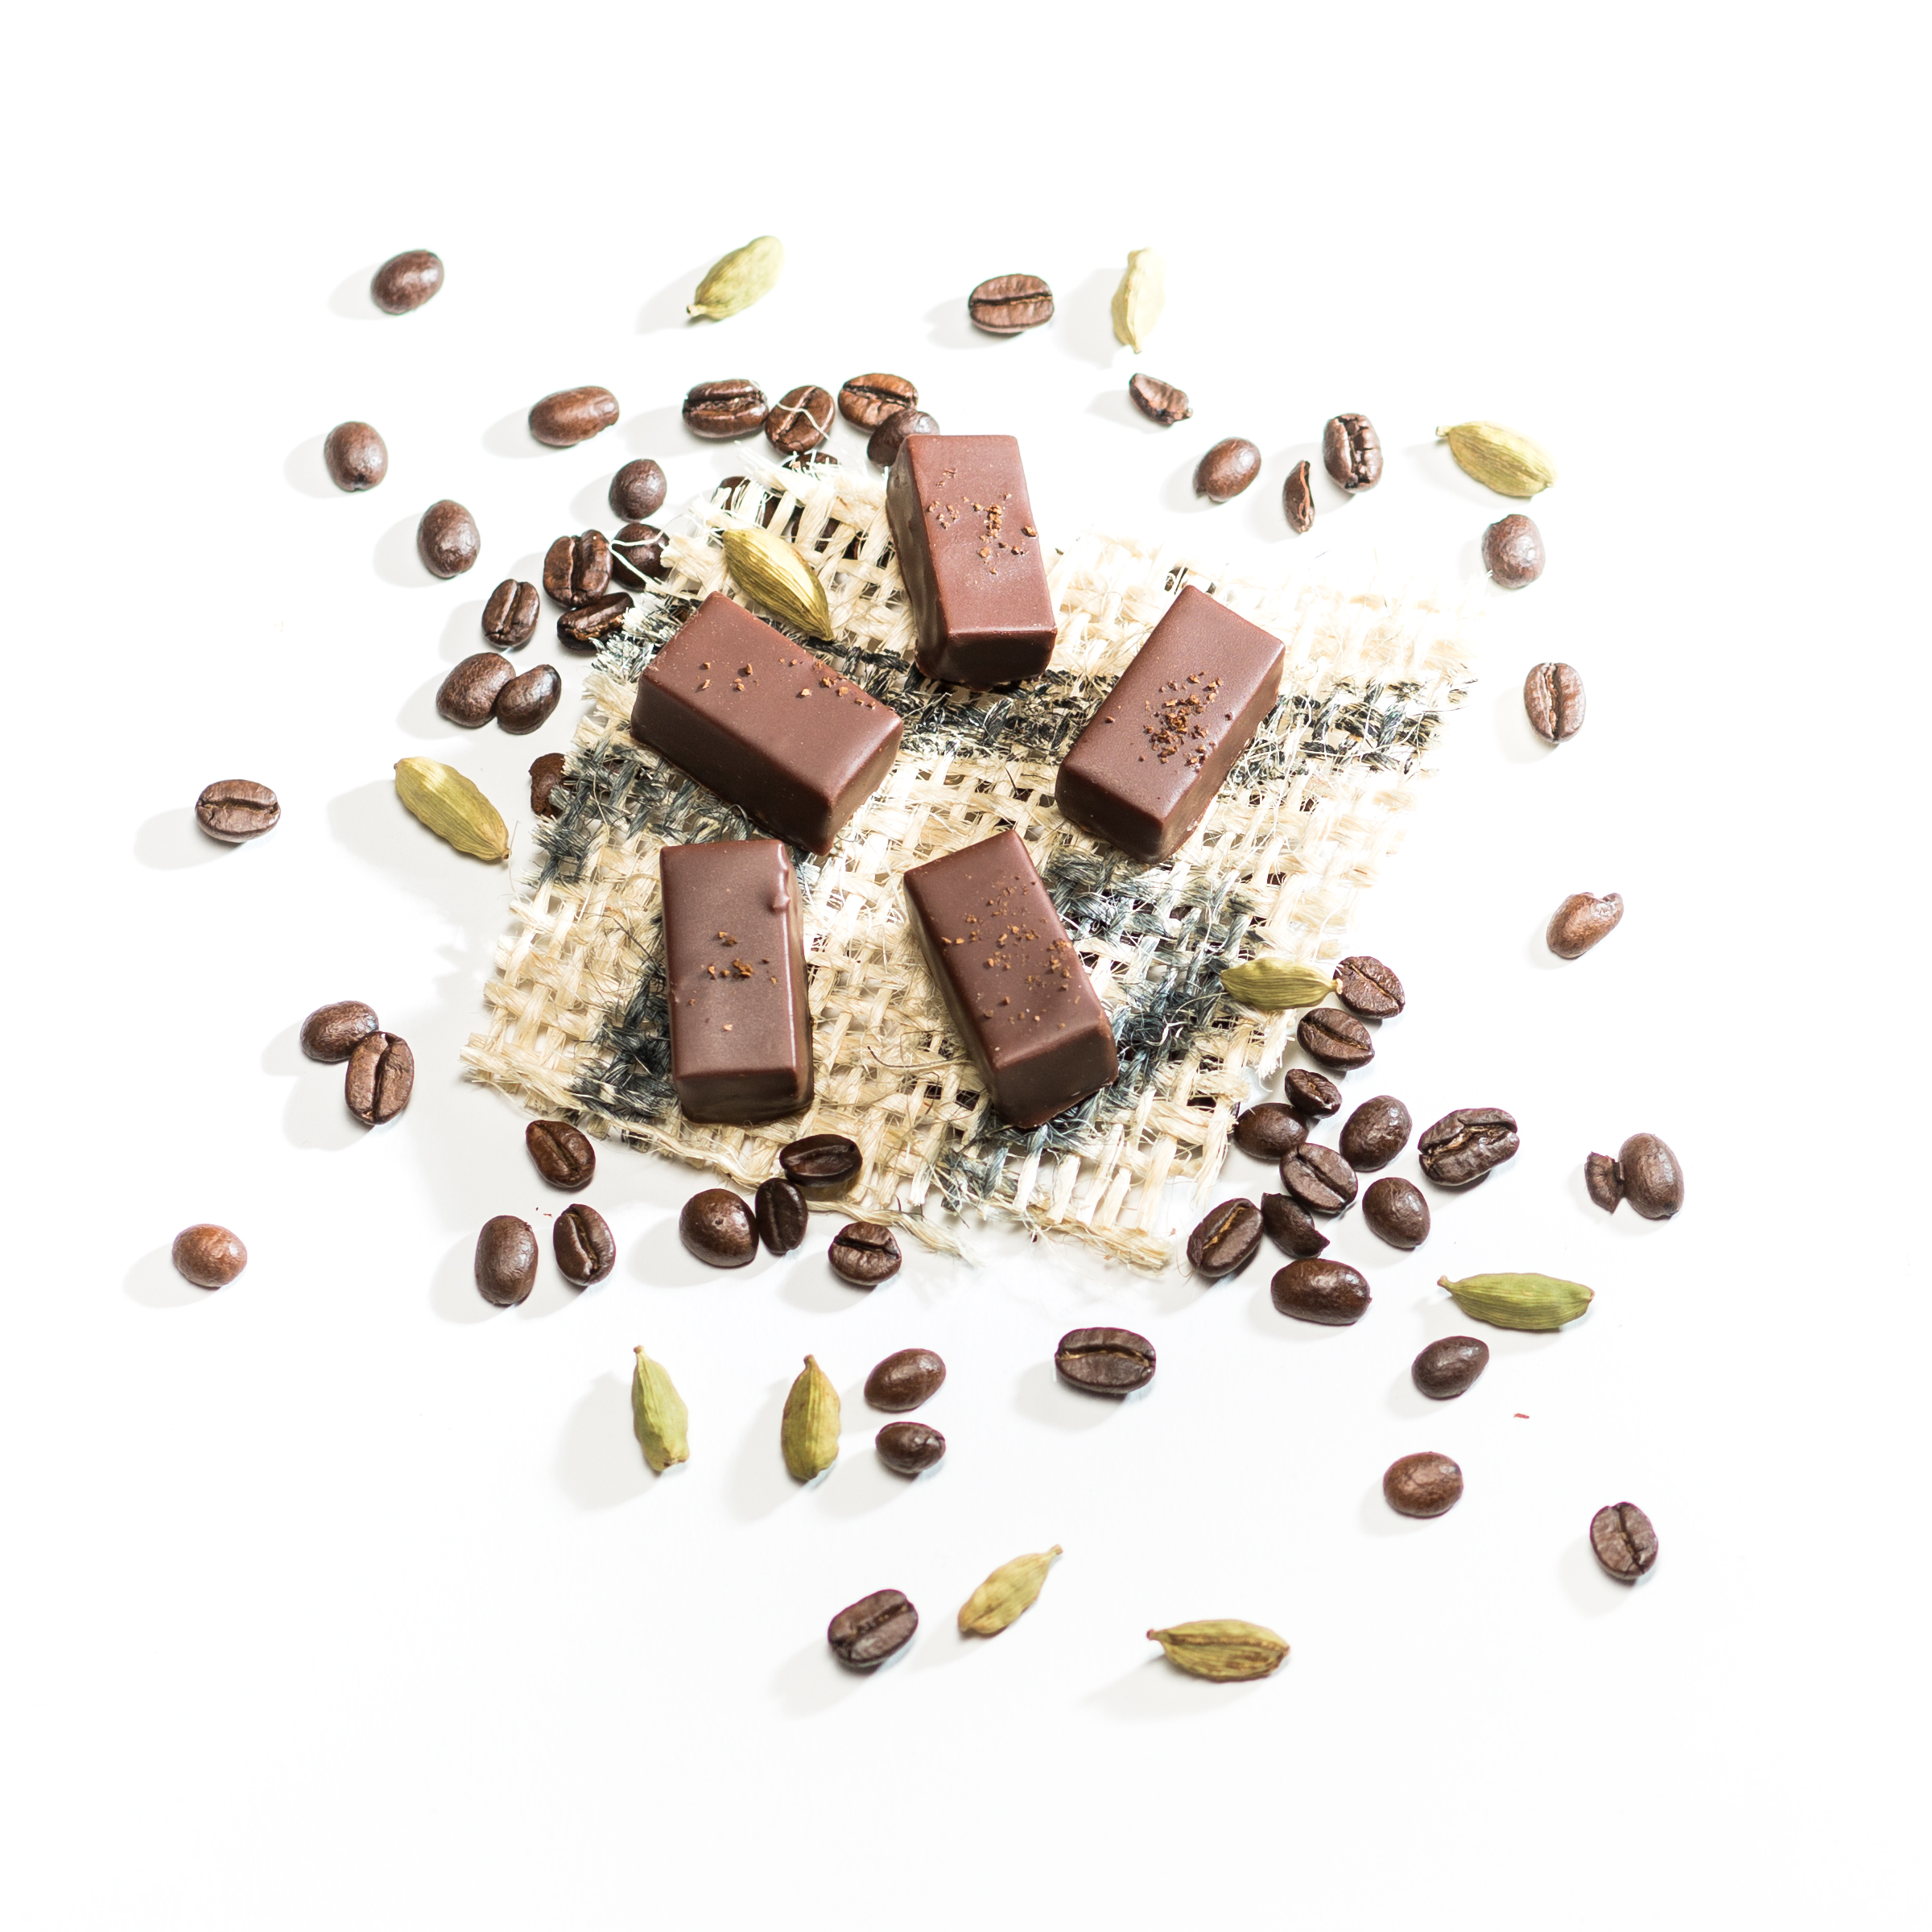 Kaffee Kardamom Schokolade